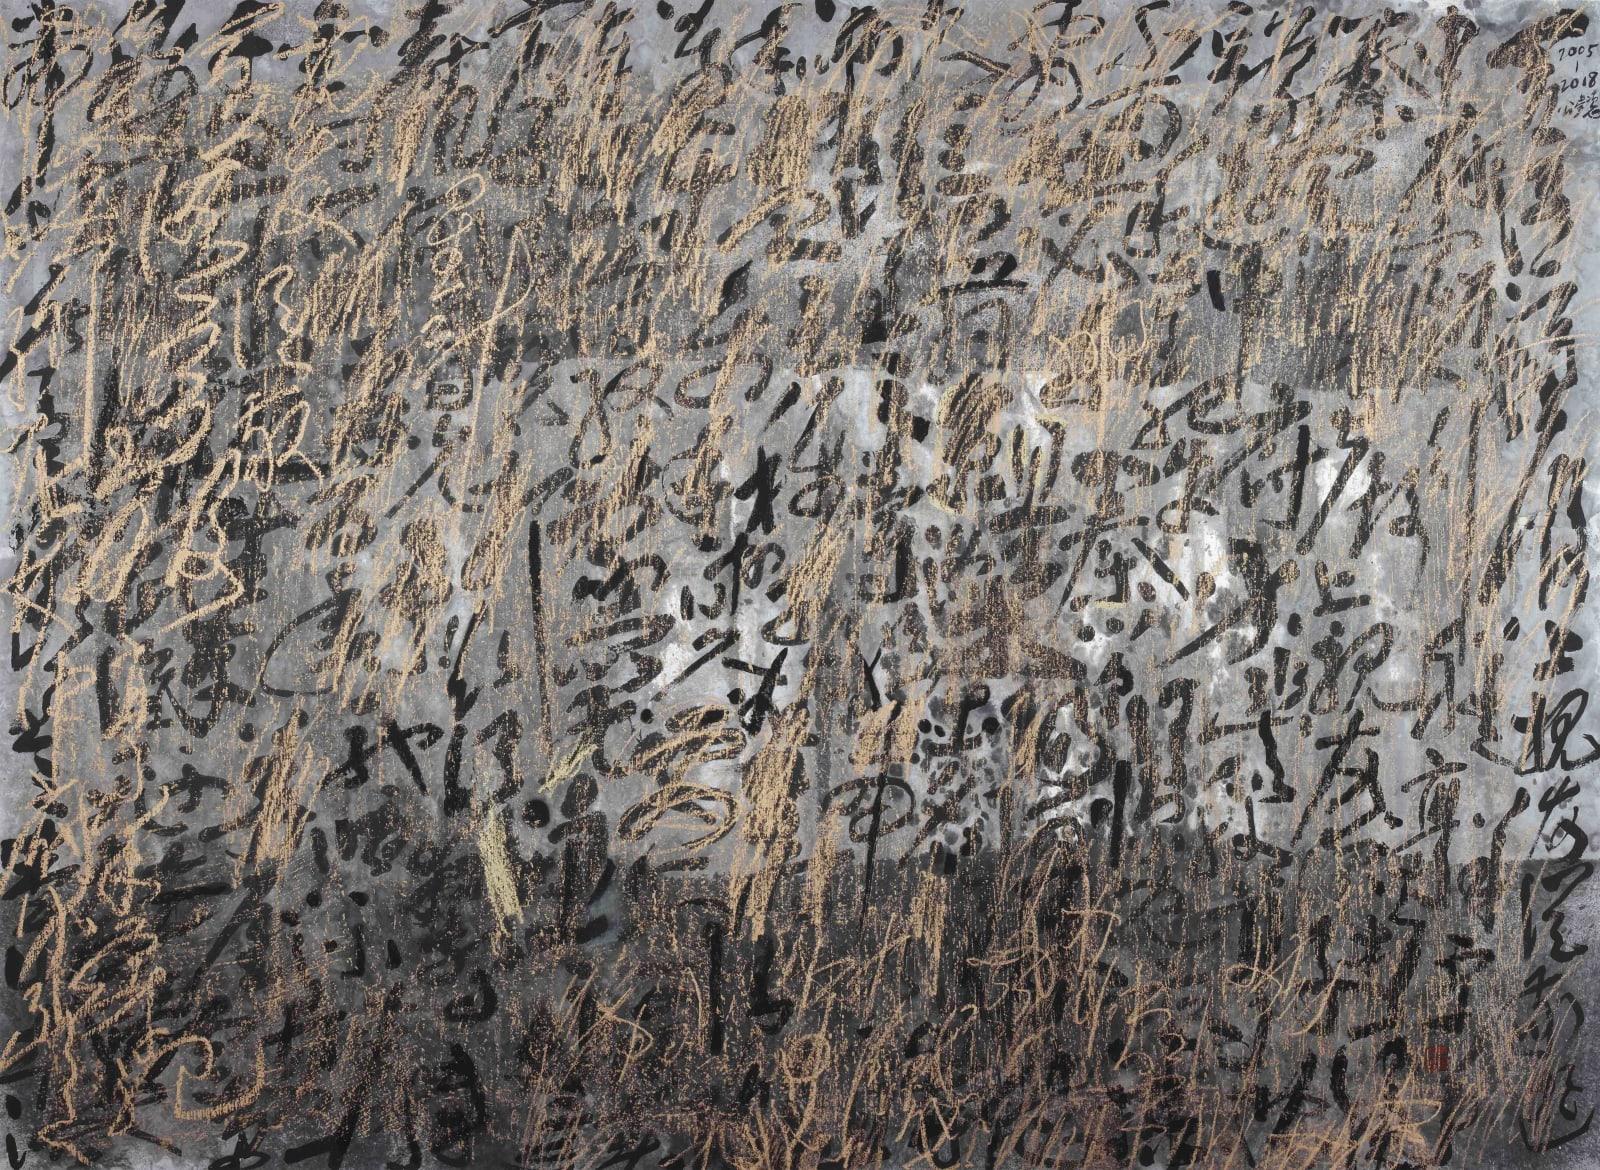 Wang Gongyi 王公懿, Golden Cursive Script 金光草書, 2005-2018